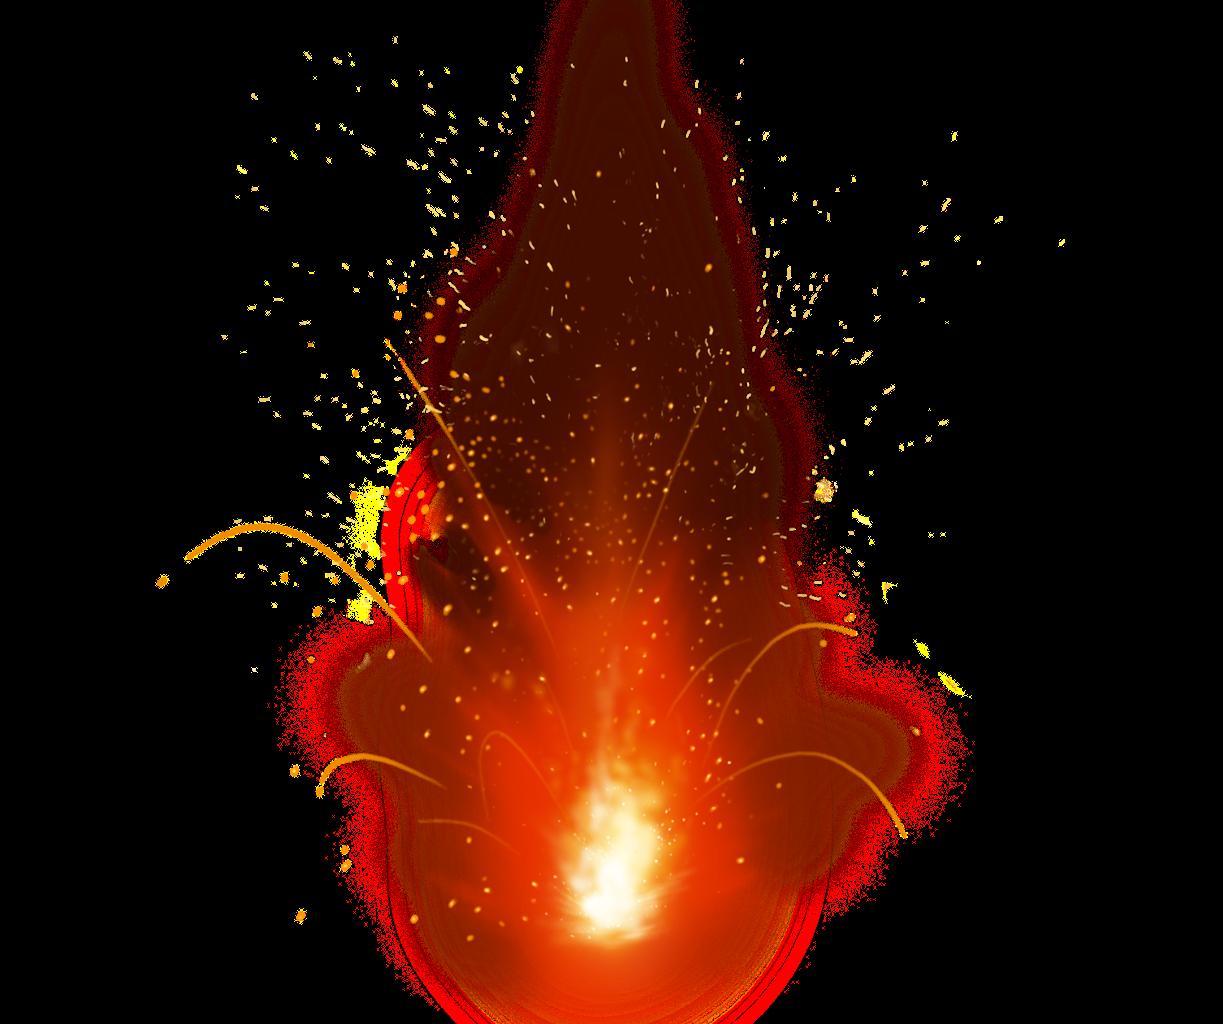 Clipart gun bomb. Explosion pgntree com fire